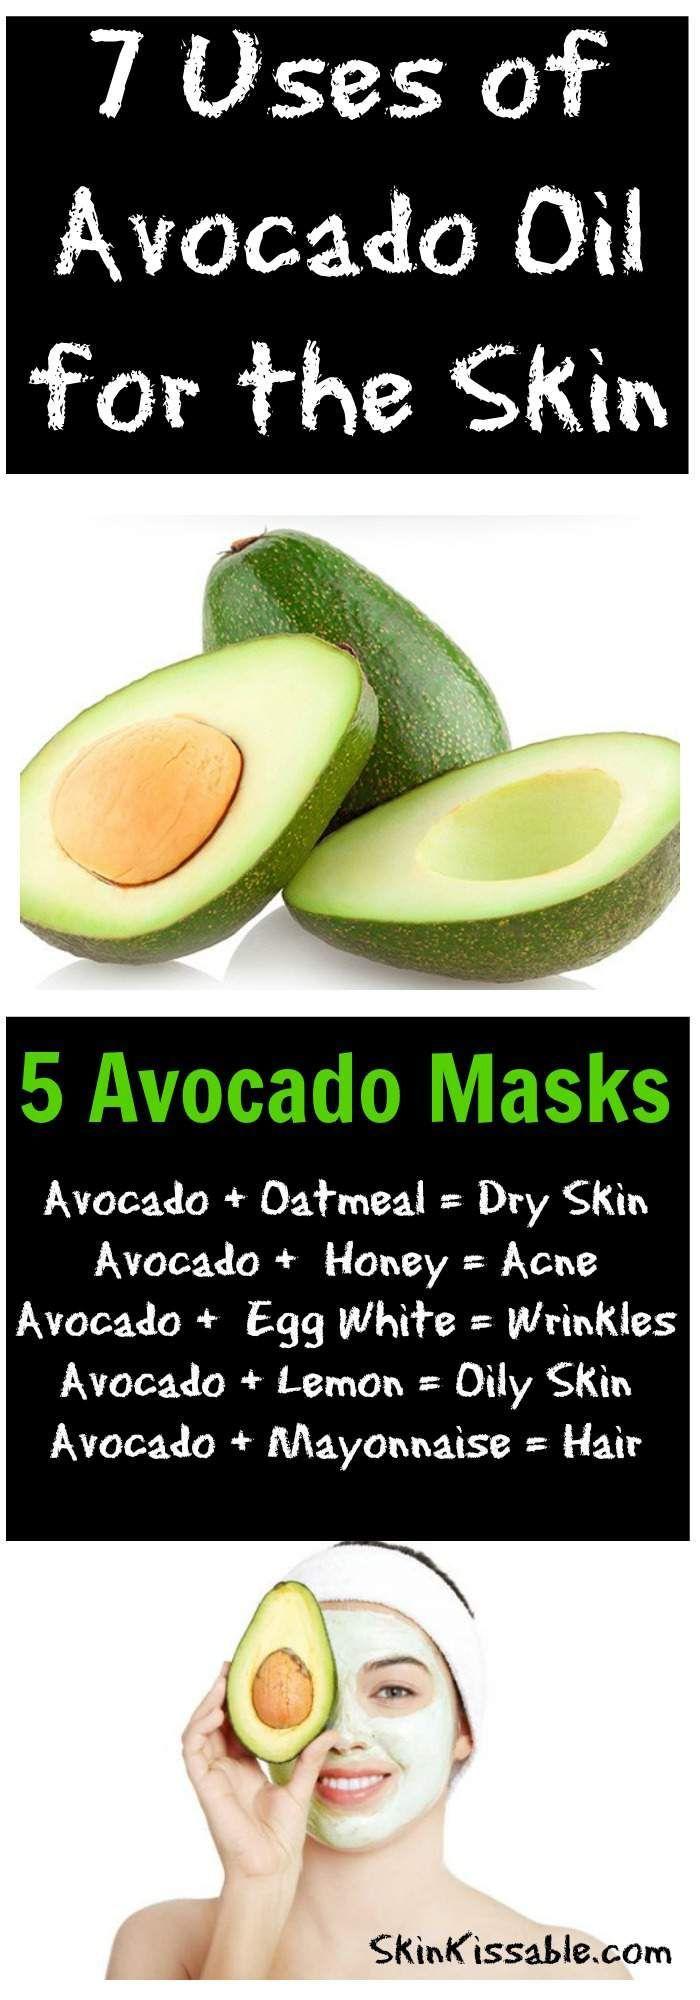 What Do You Use Emu Oil For Emu Oil Uses Benefits For Skin Hair Essential Oils For Skin Avocado Oil Skin Skin Care Recipes